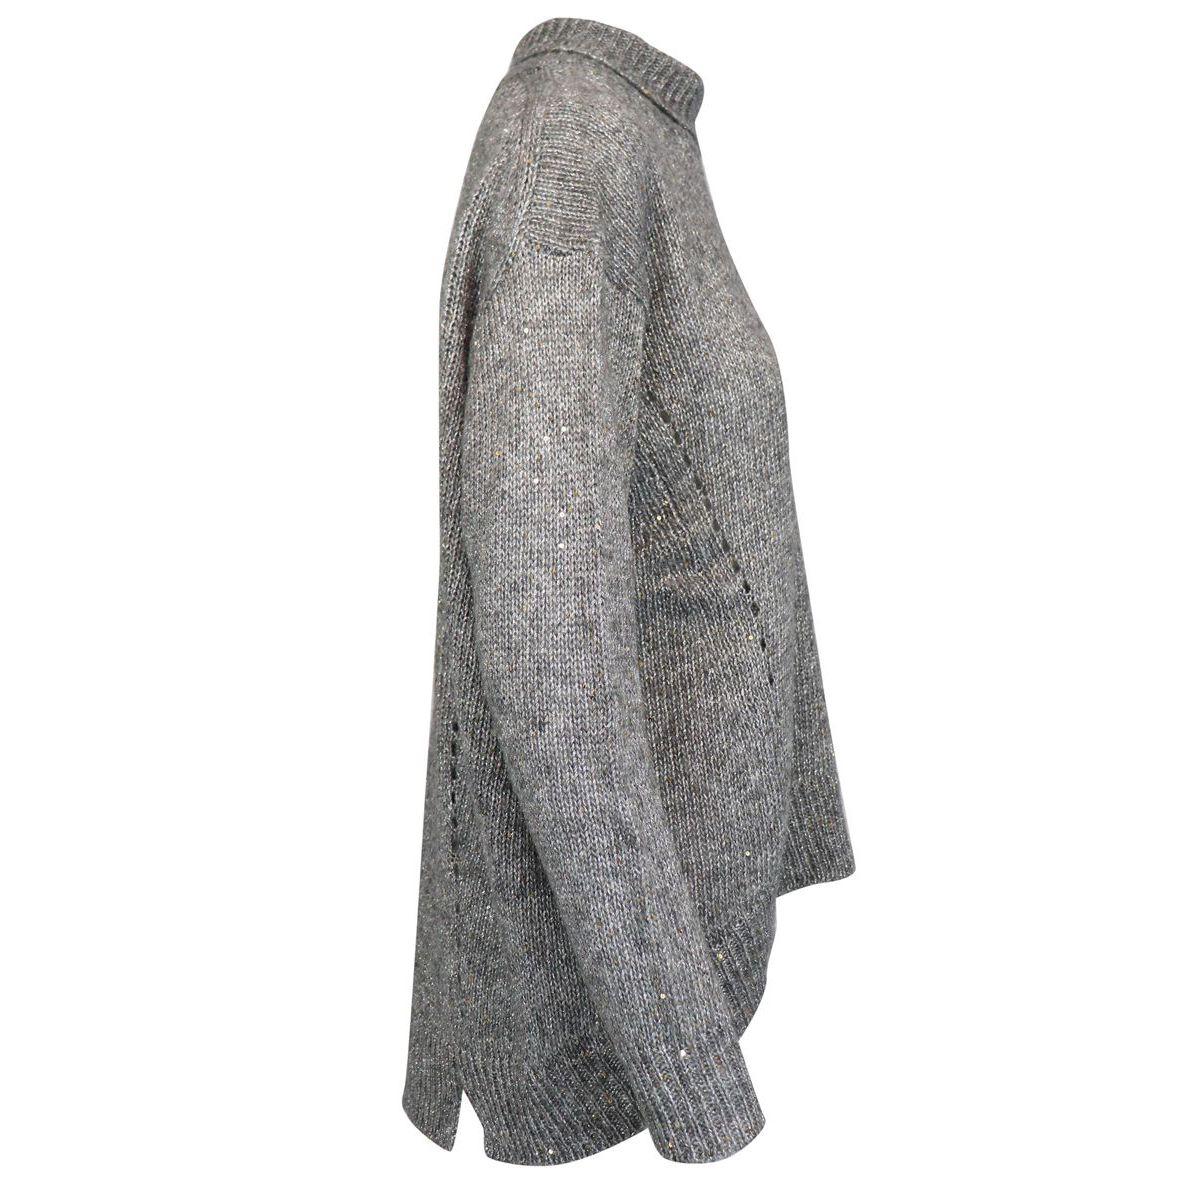 Lurex wool blend turtleneck sweater Light grey Alpha Studio